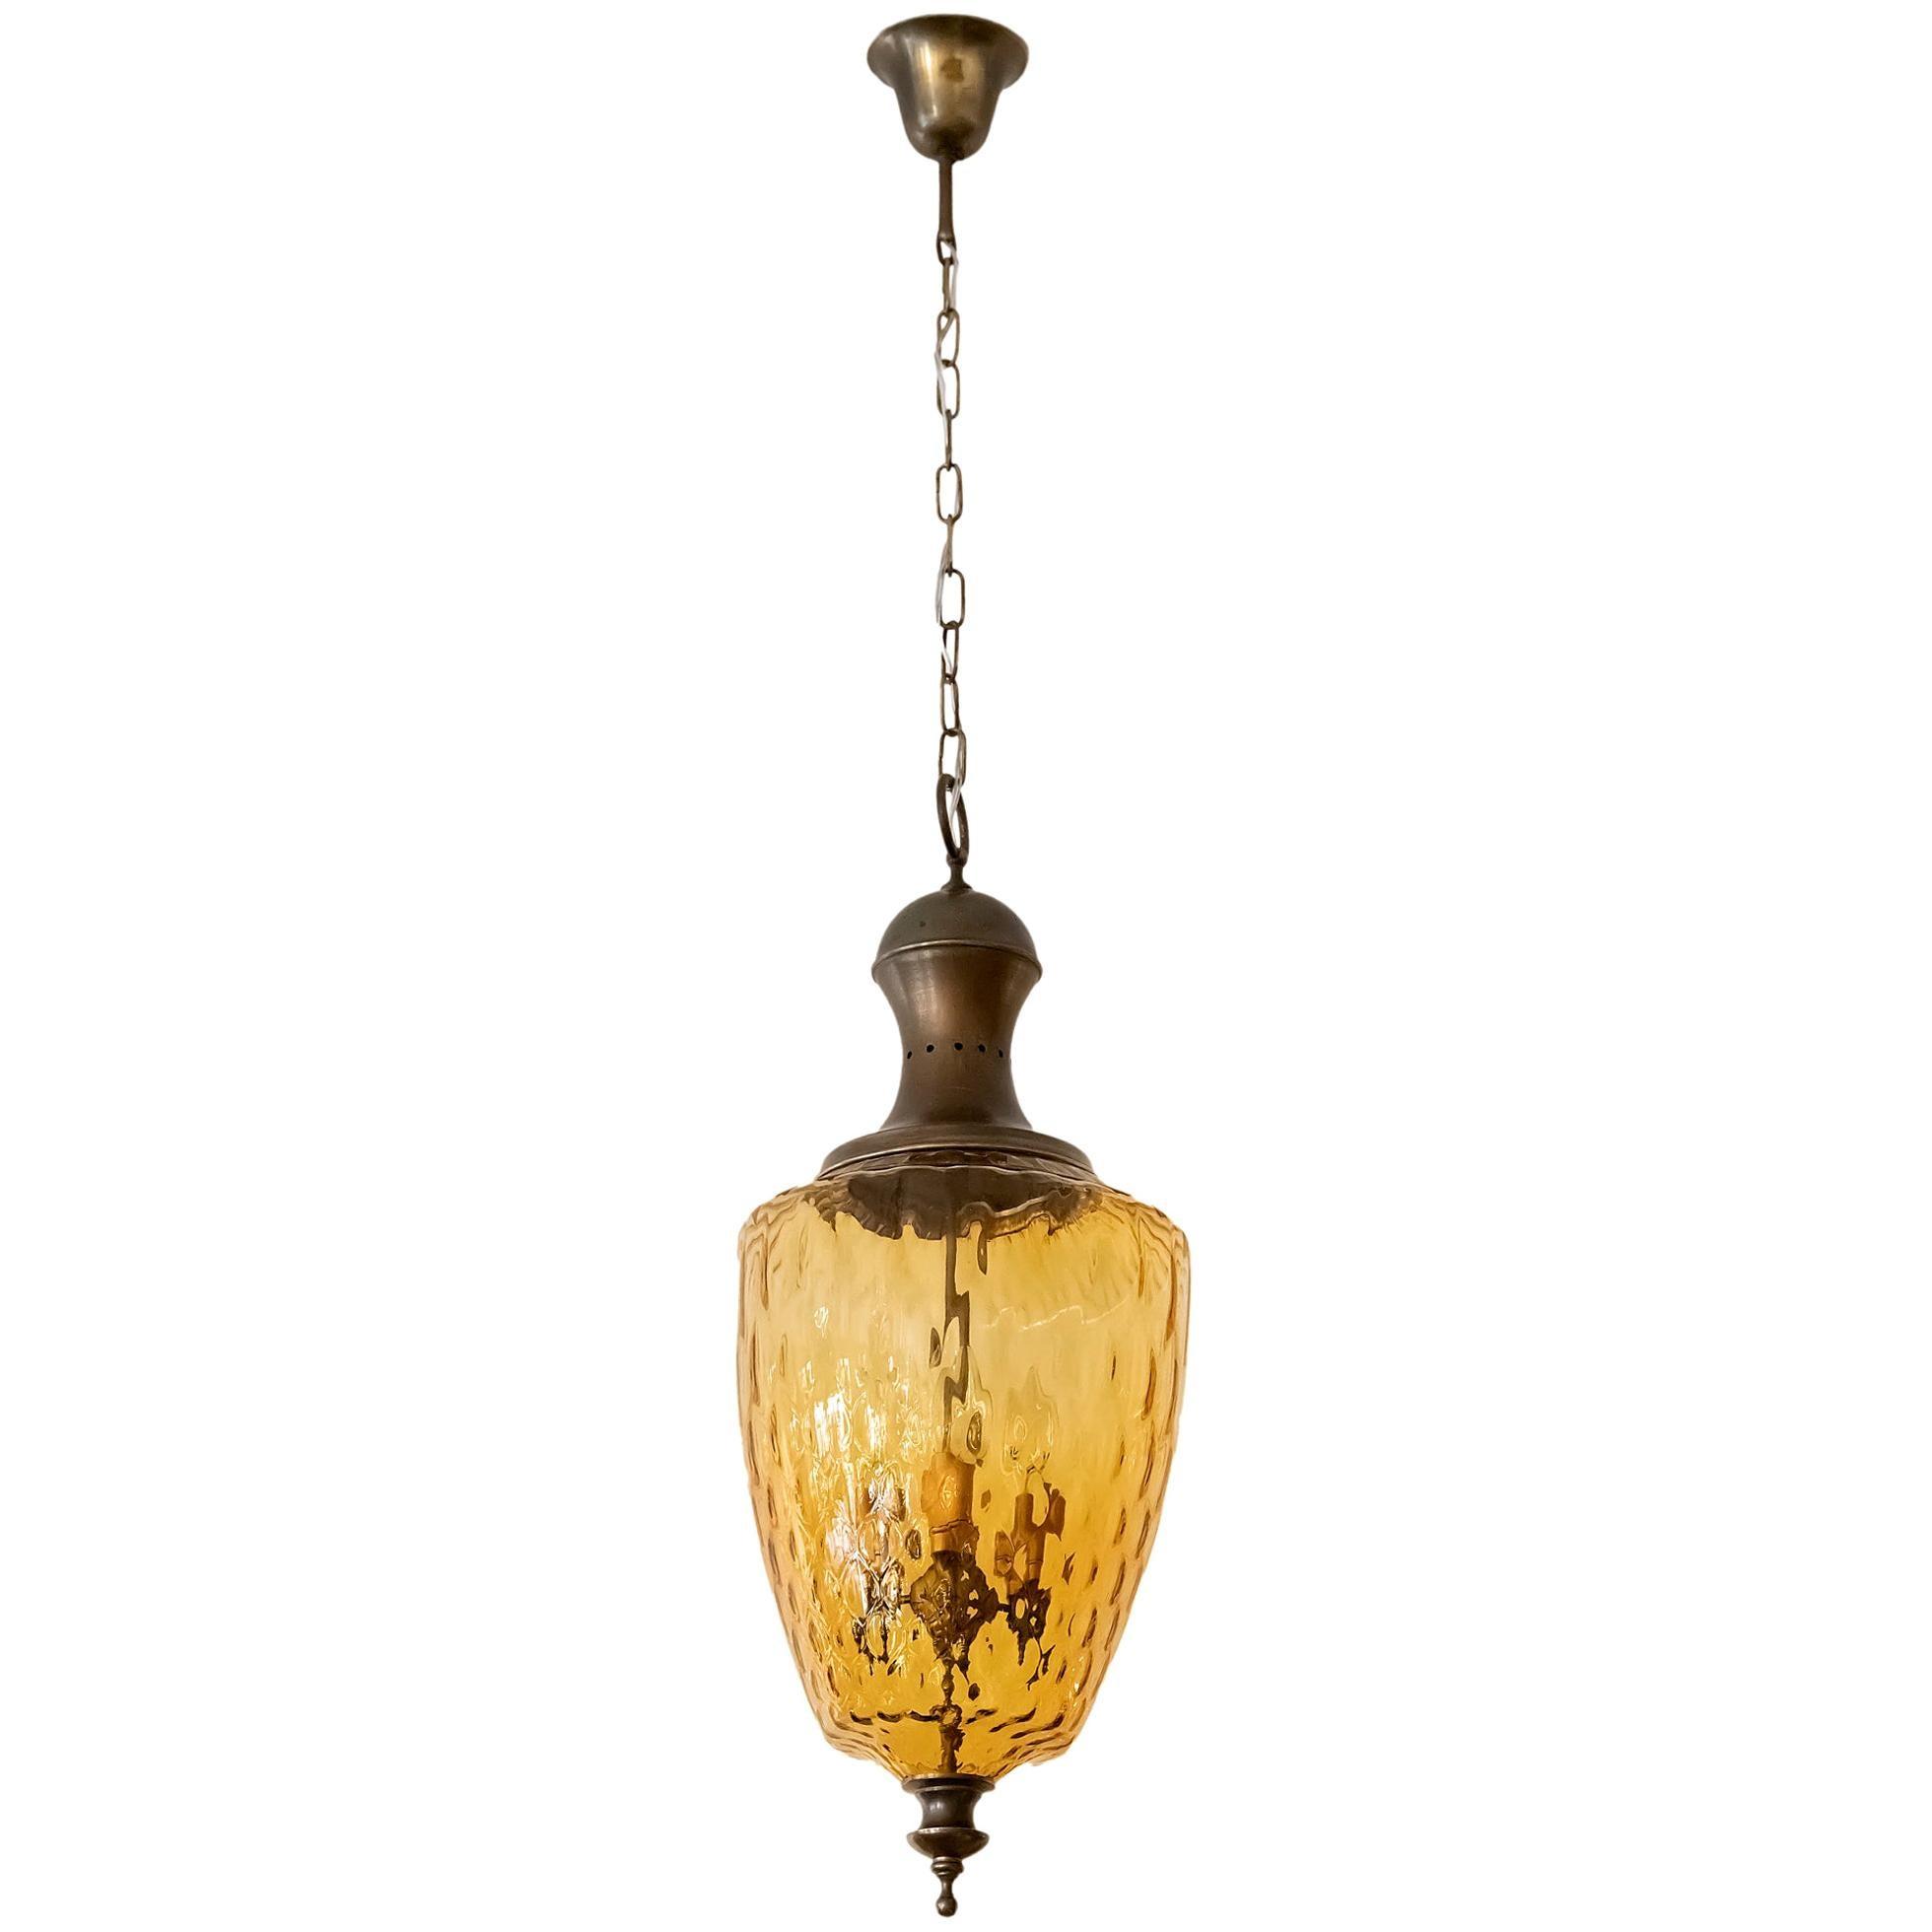 Italian Brass and Glass Chandelier Lantern, circa 1950